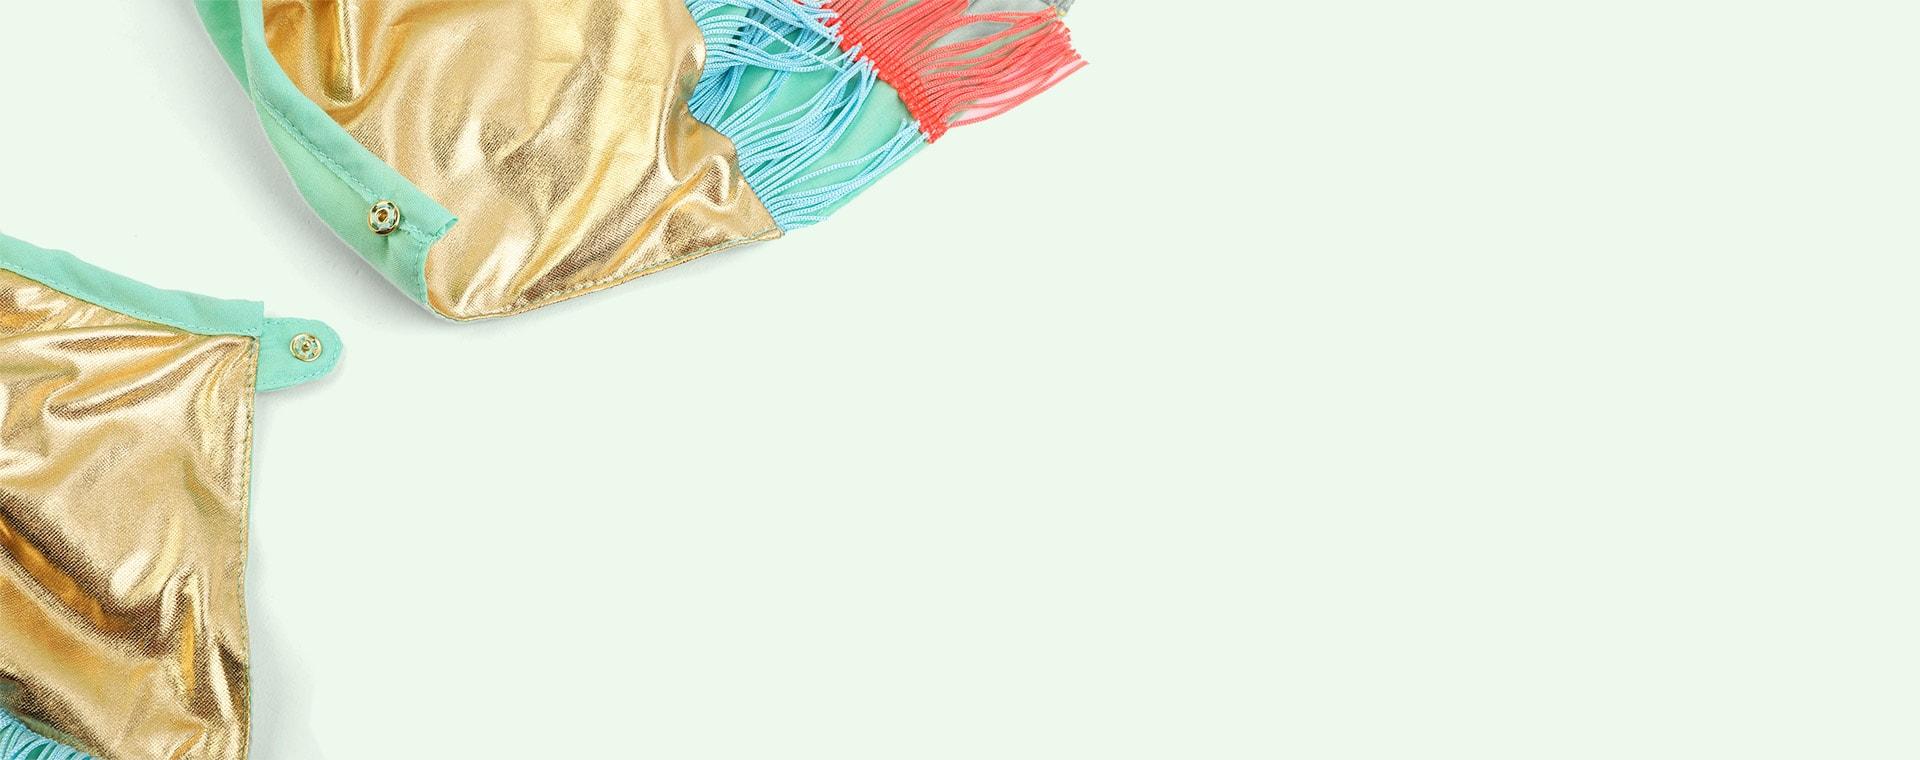 Multi Meri Meri Parrot Fringed Cape Dress up